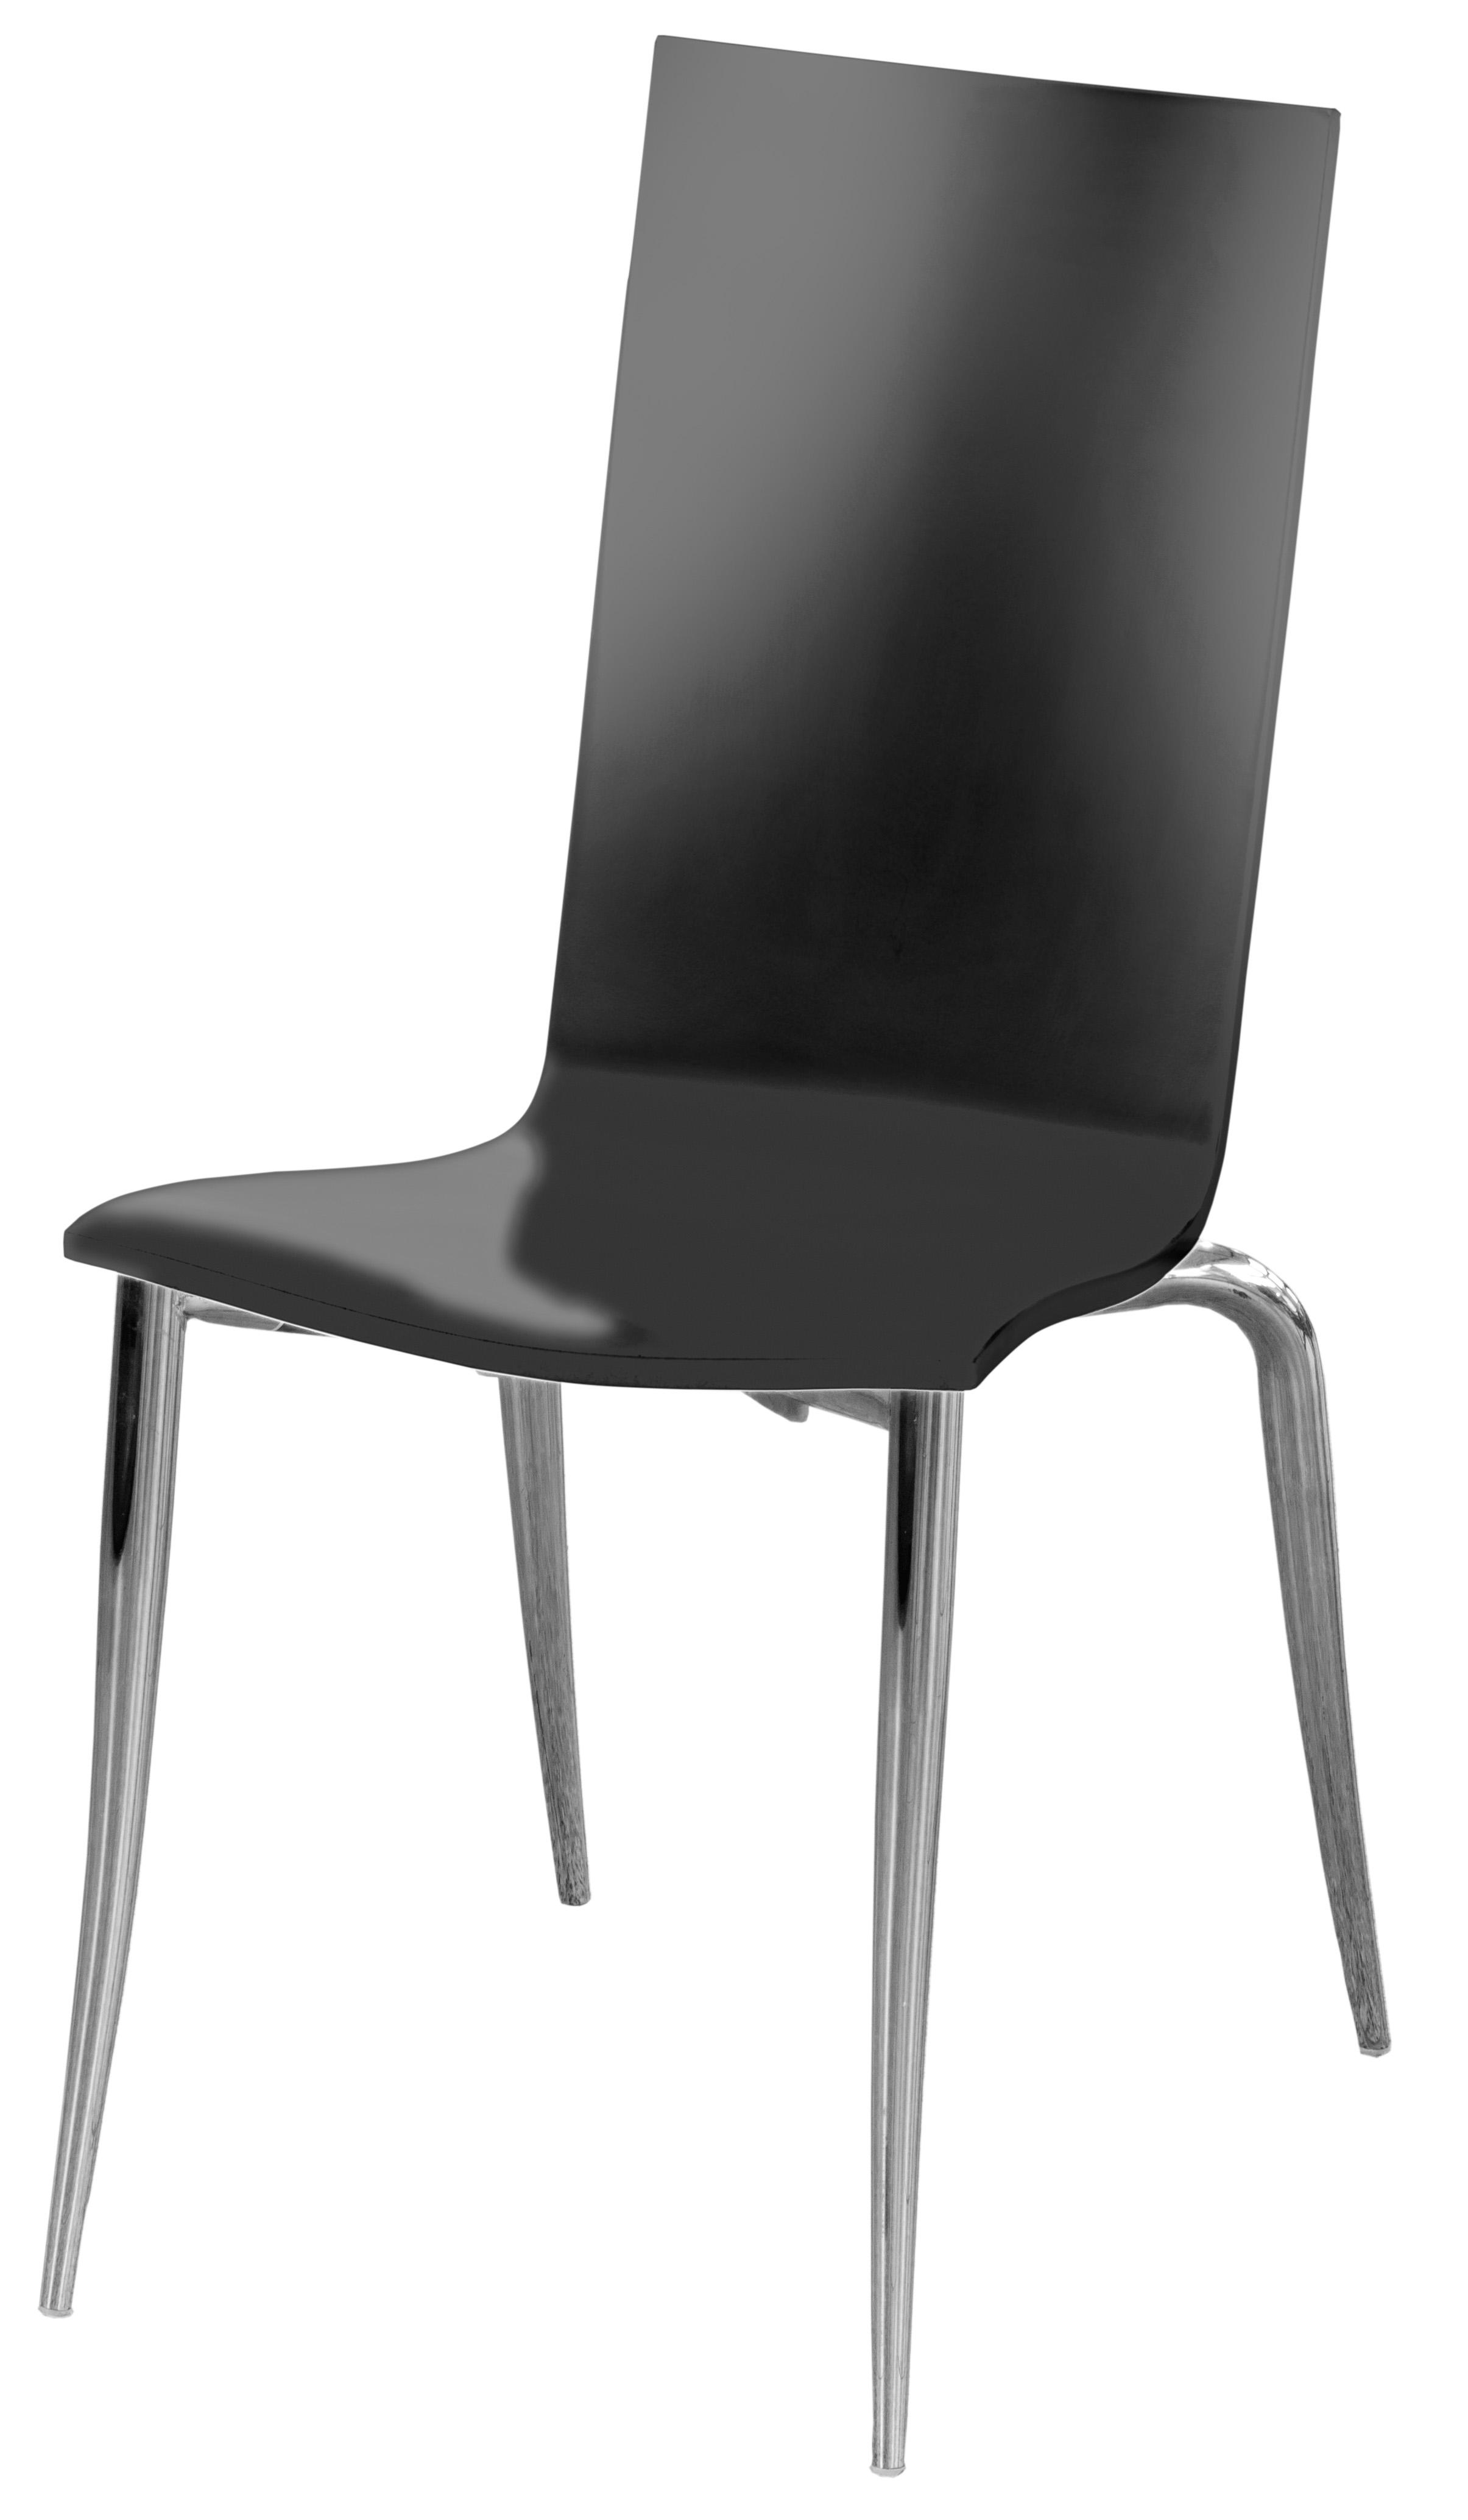 OLLY TANGO von Philippe Starck